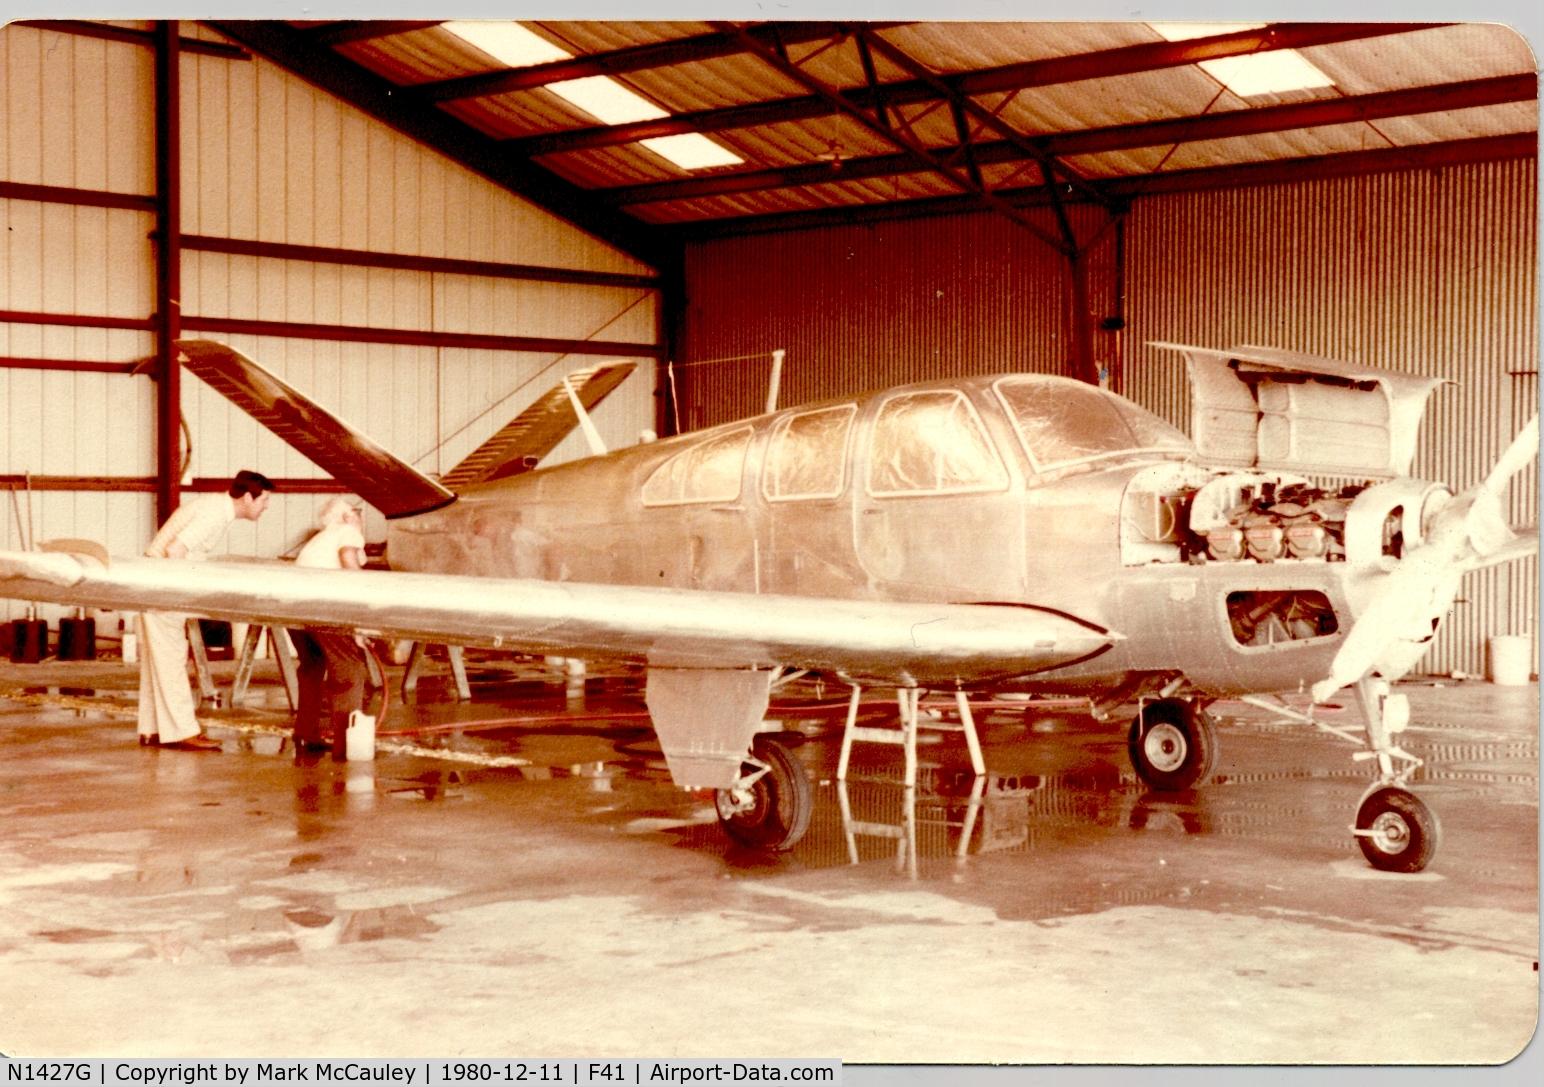 N1427G, 1962 Beech P35 Bonanza C/N D-6903, P35 Bonanza N1427G at Poplawski Aircraft Paint in Ennis, TX (1980)